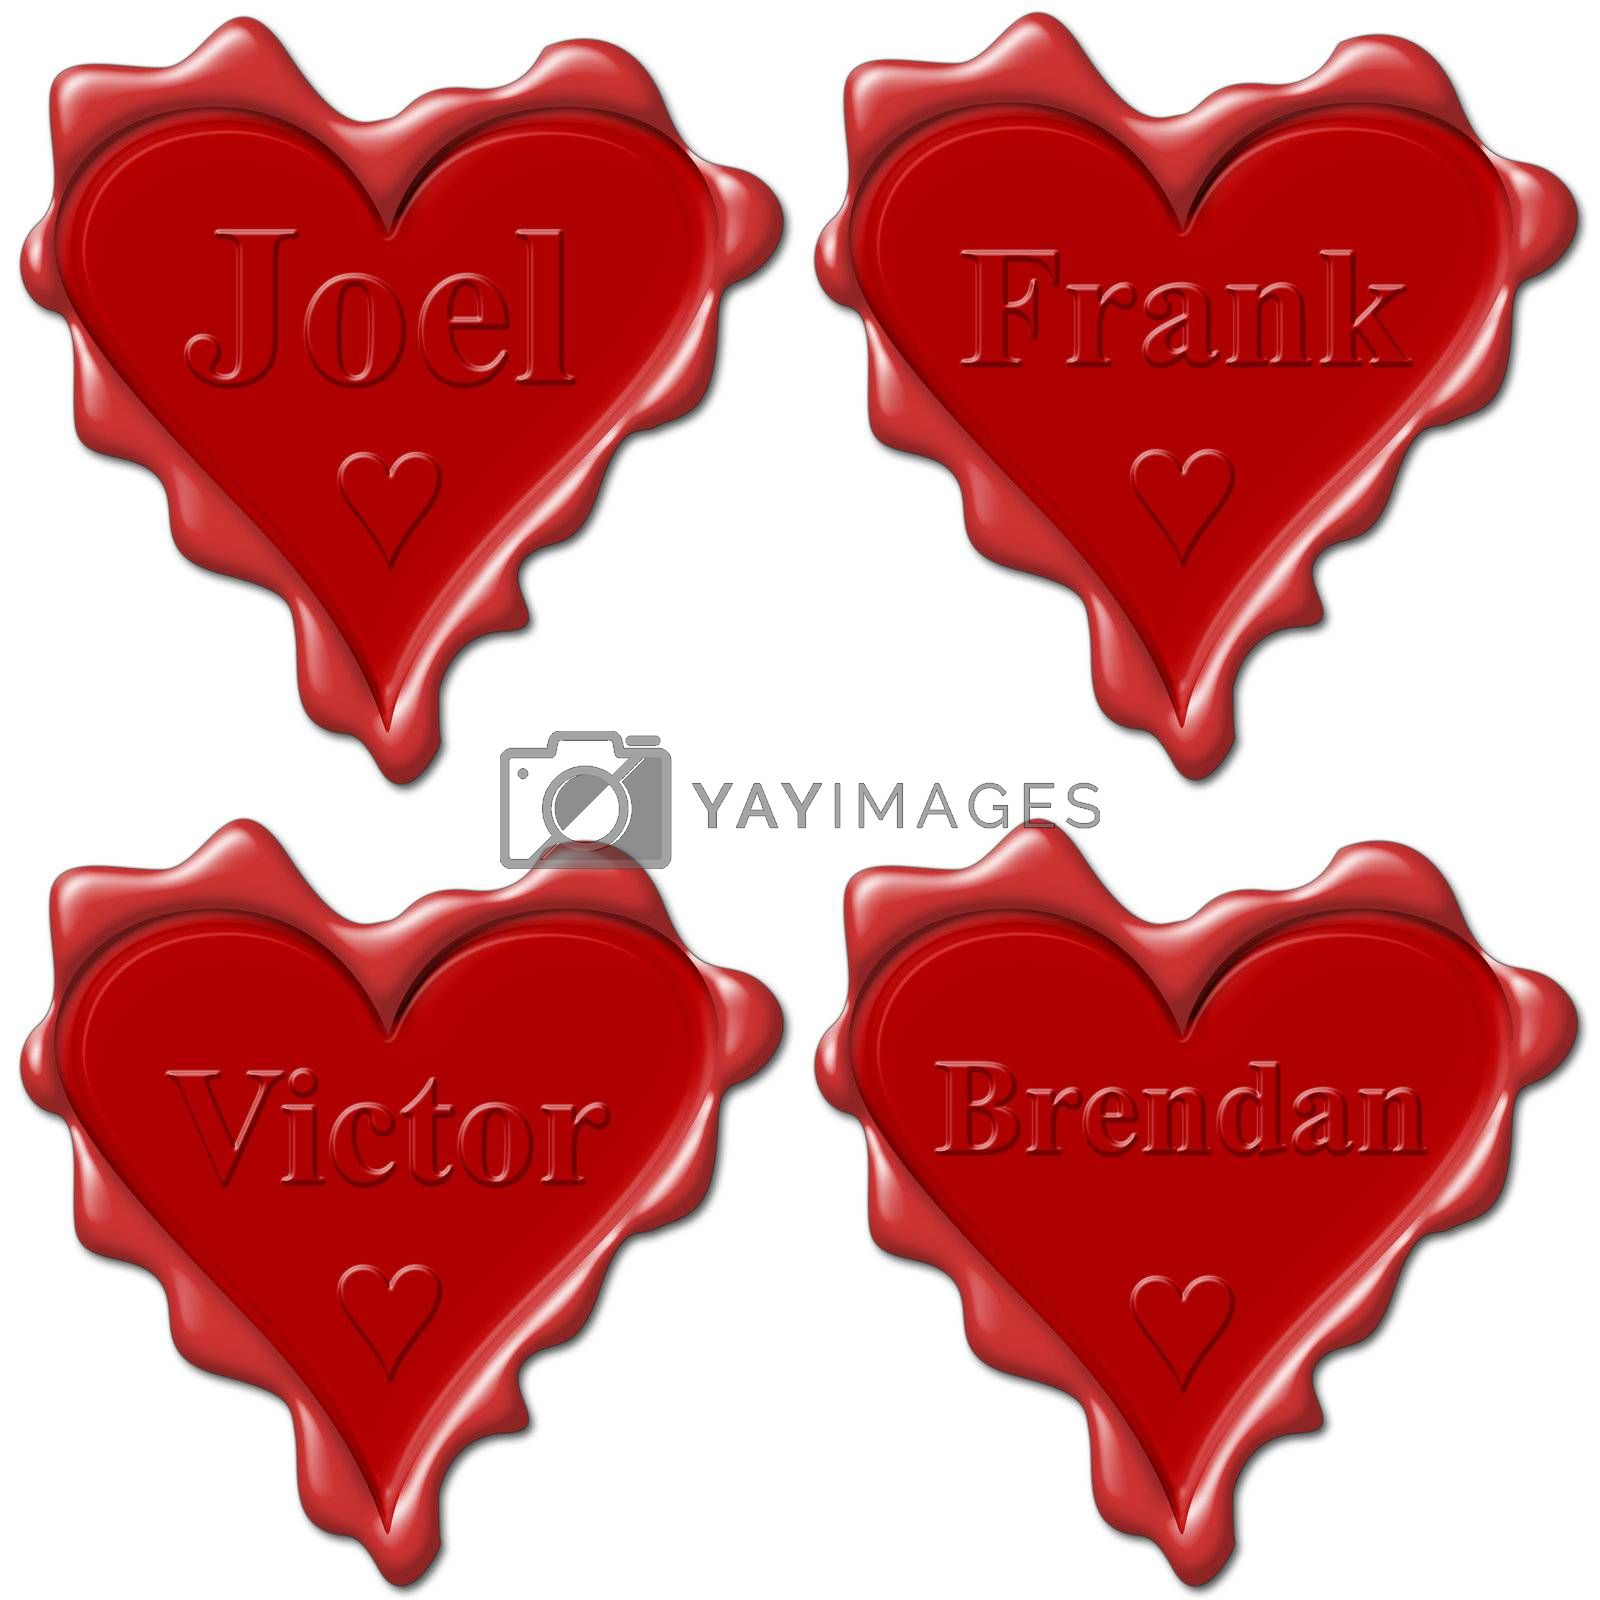 Valentine love hearts with names: Joel, Frank, Victor, Brendan